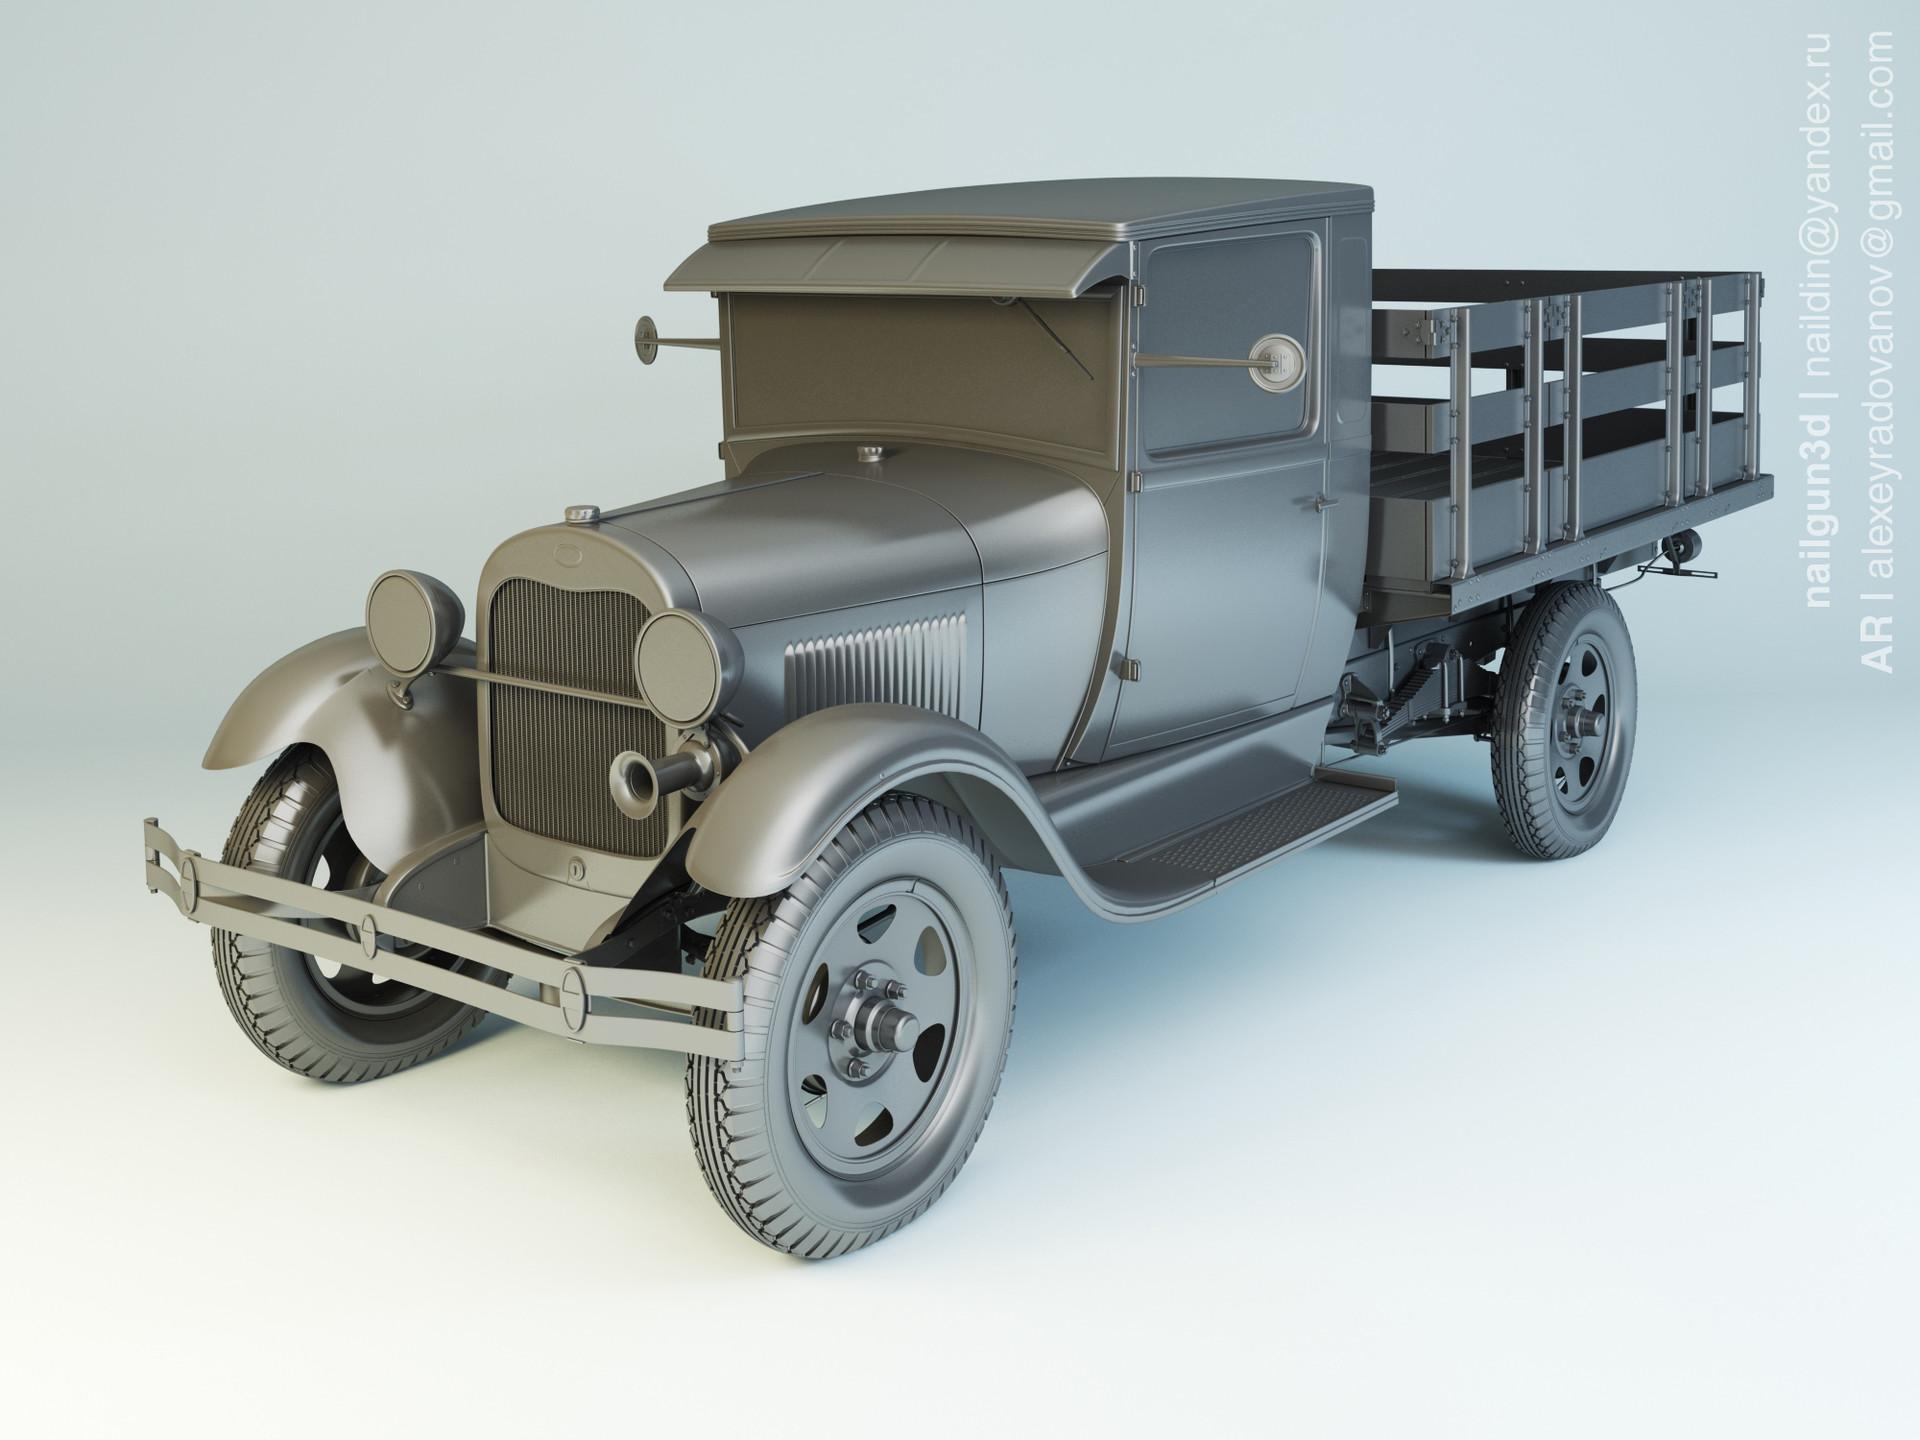 Nail khusnutdinov als 222 003 ford aa 1929 modelling 0